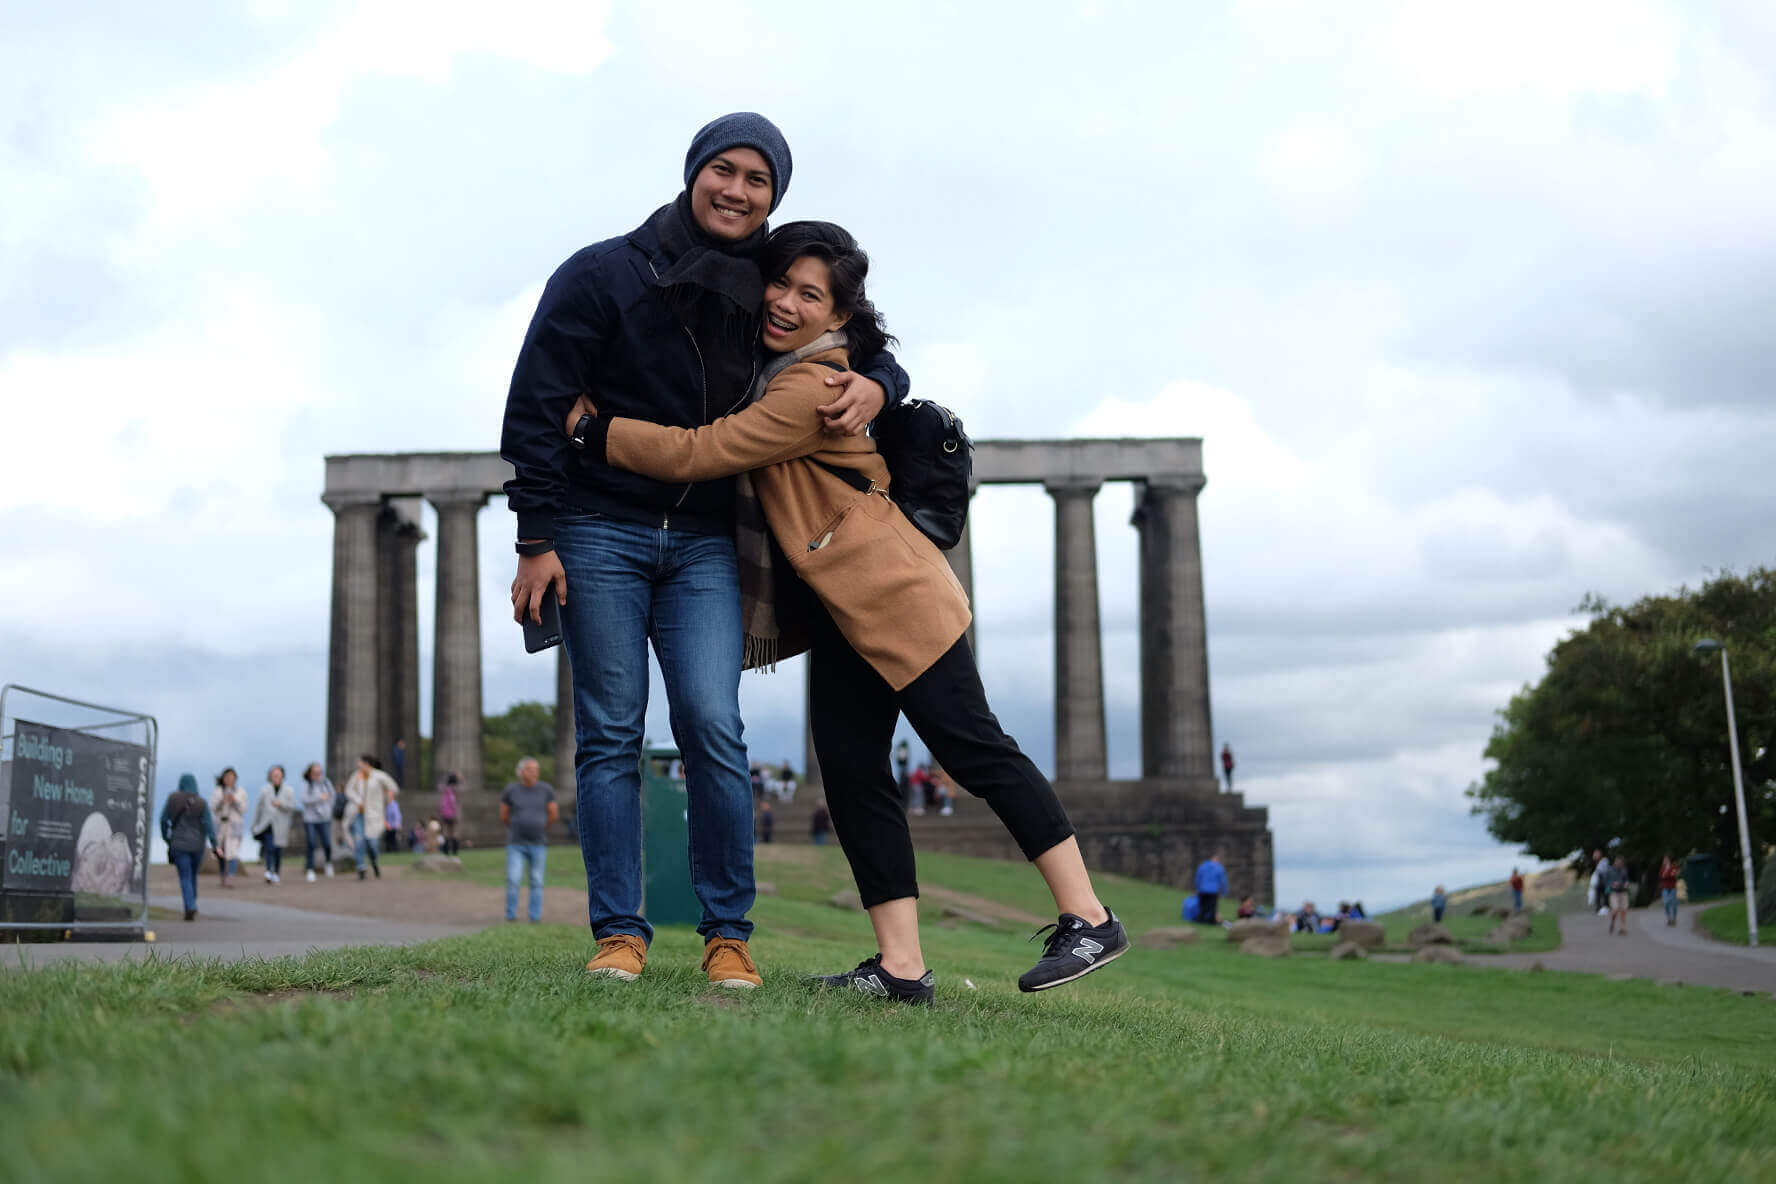 Eli and Cha in Arthur's Peak, Edinburgh